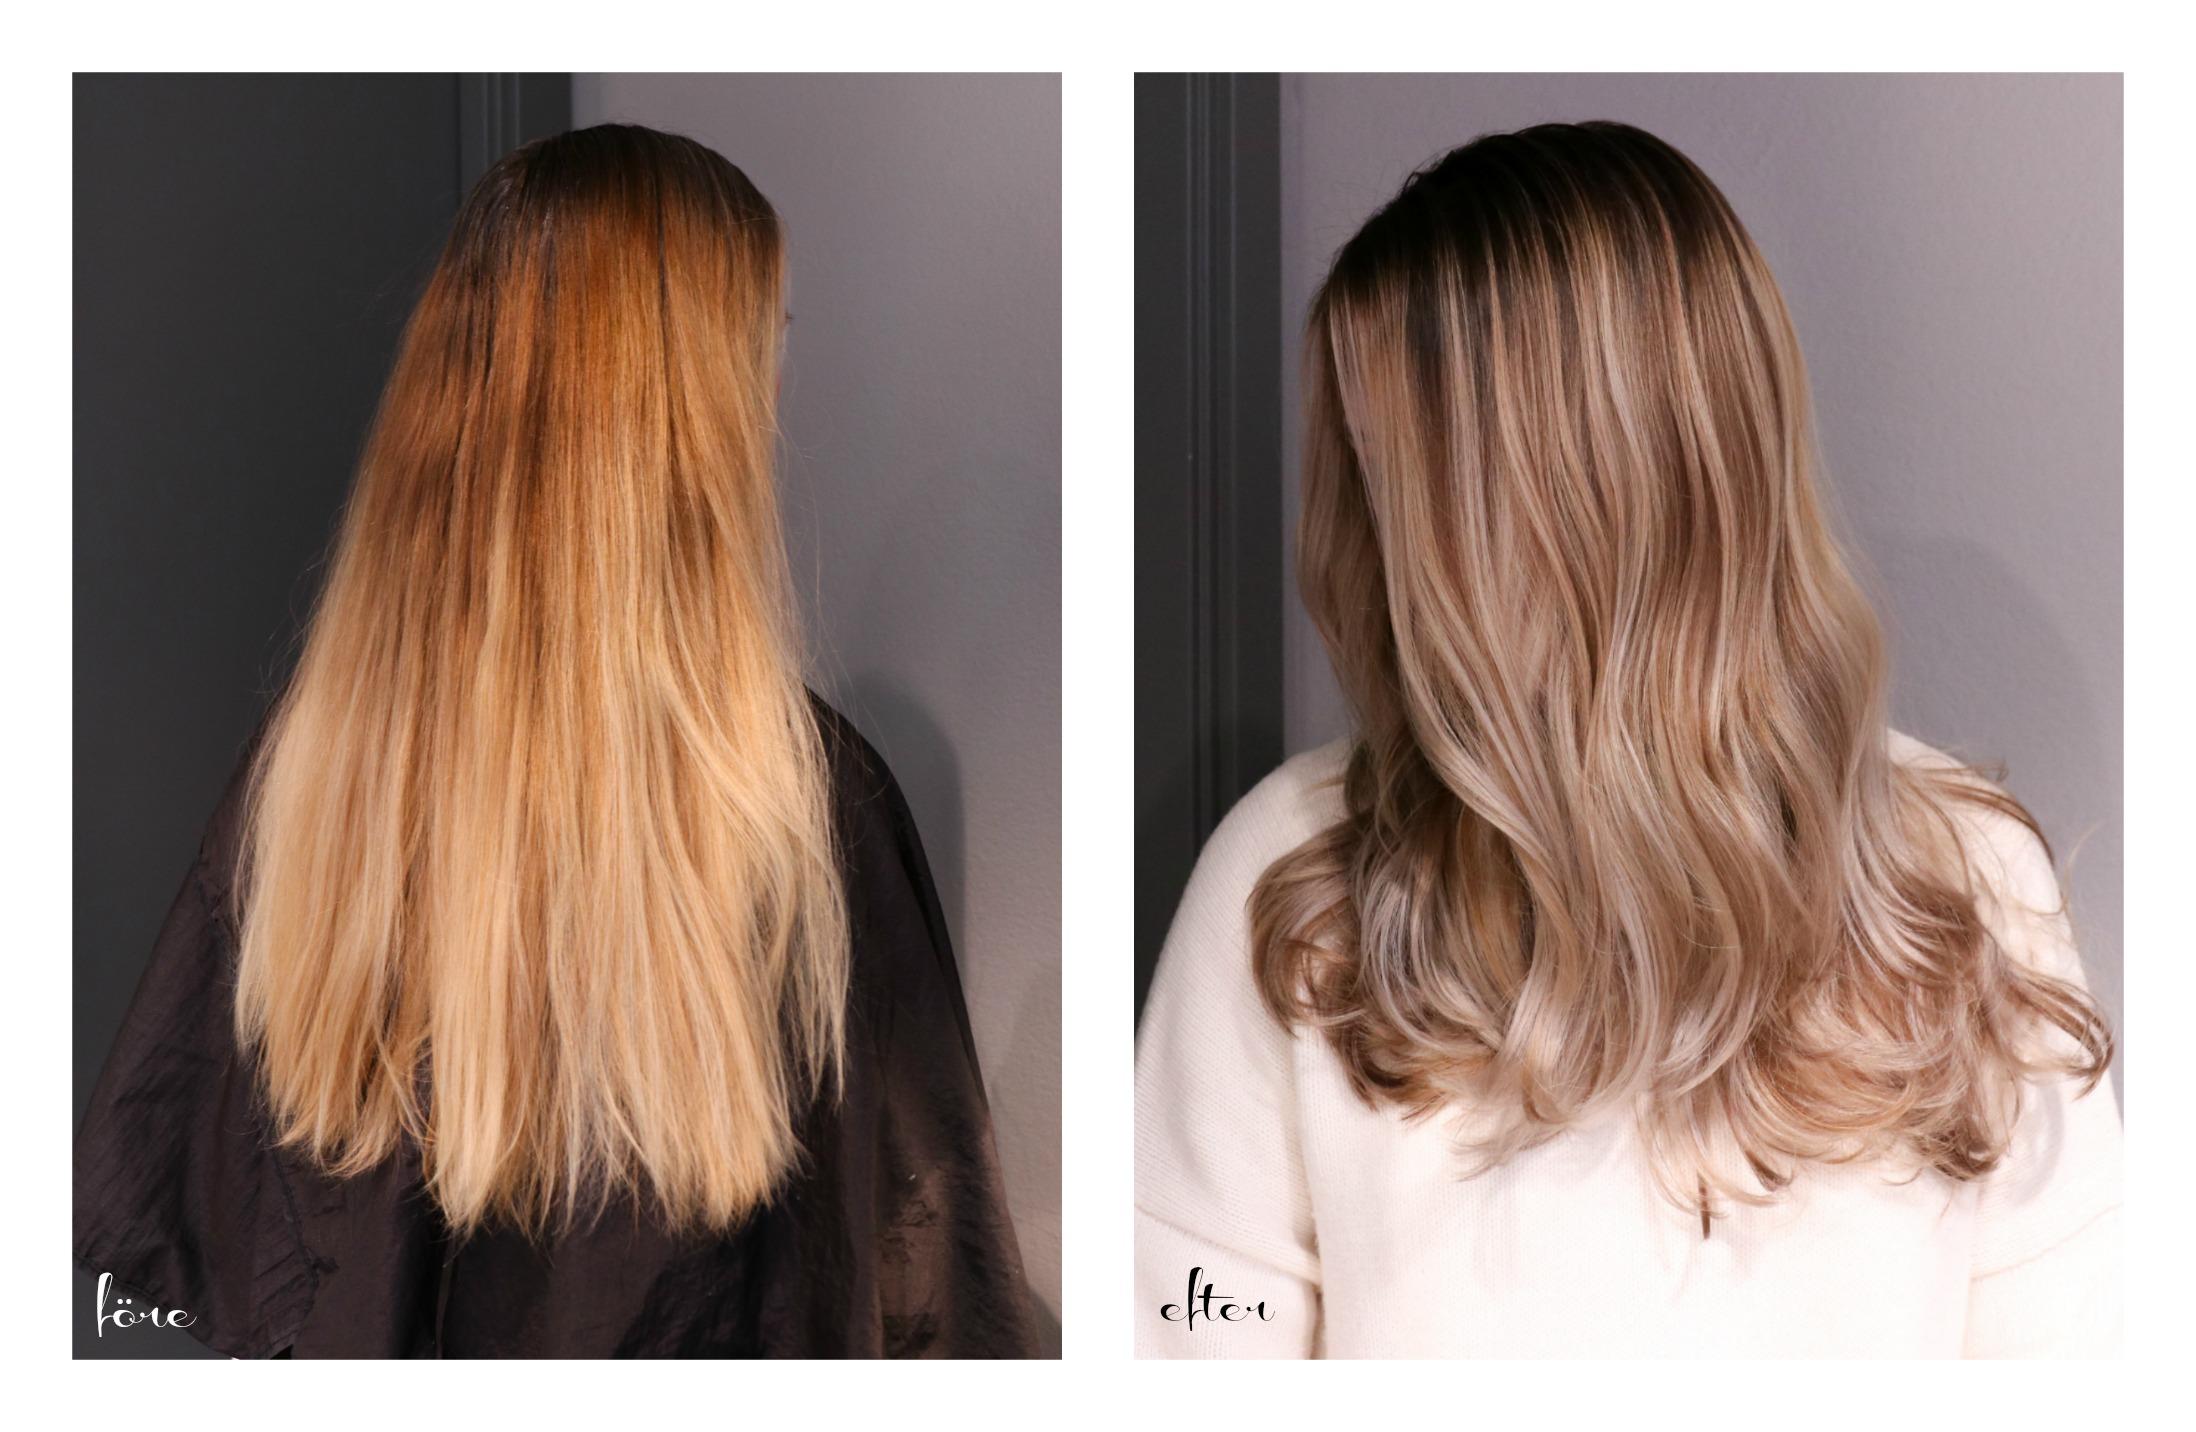 Kan hårfärg bli gammal